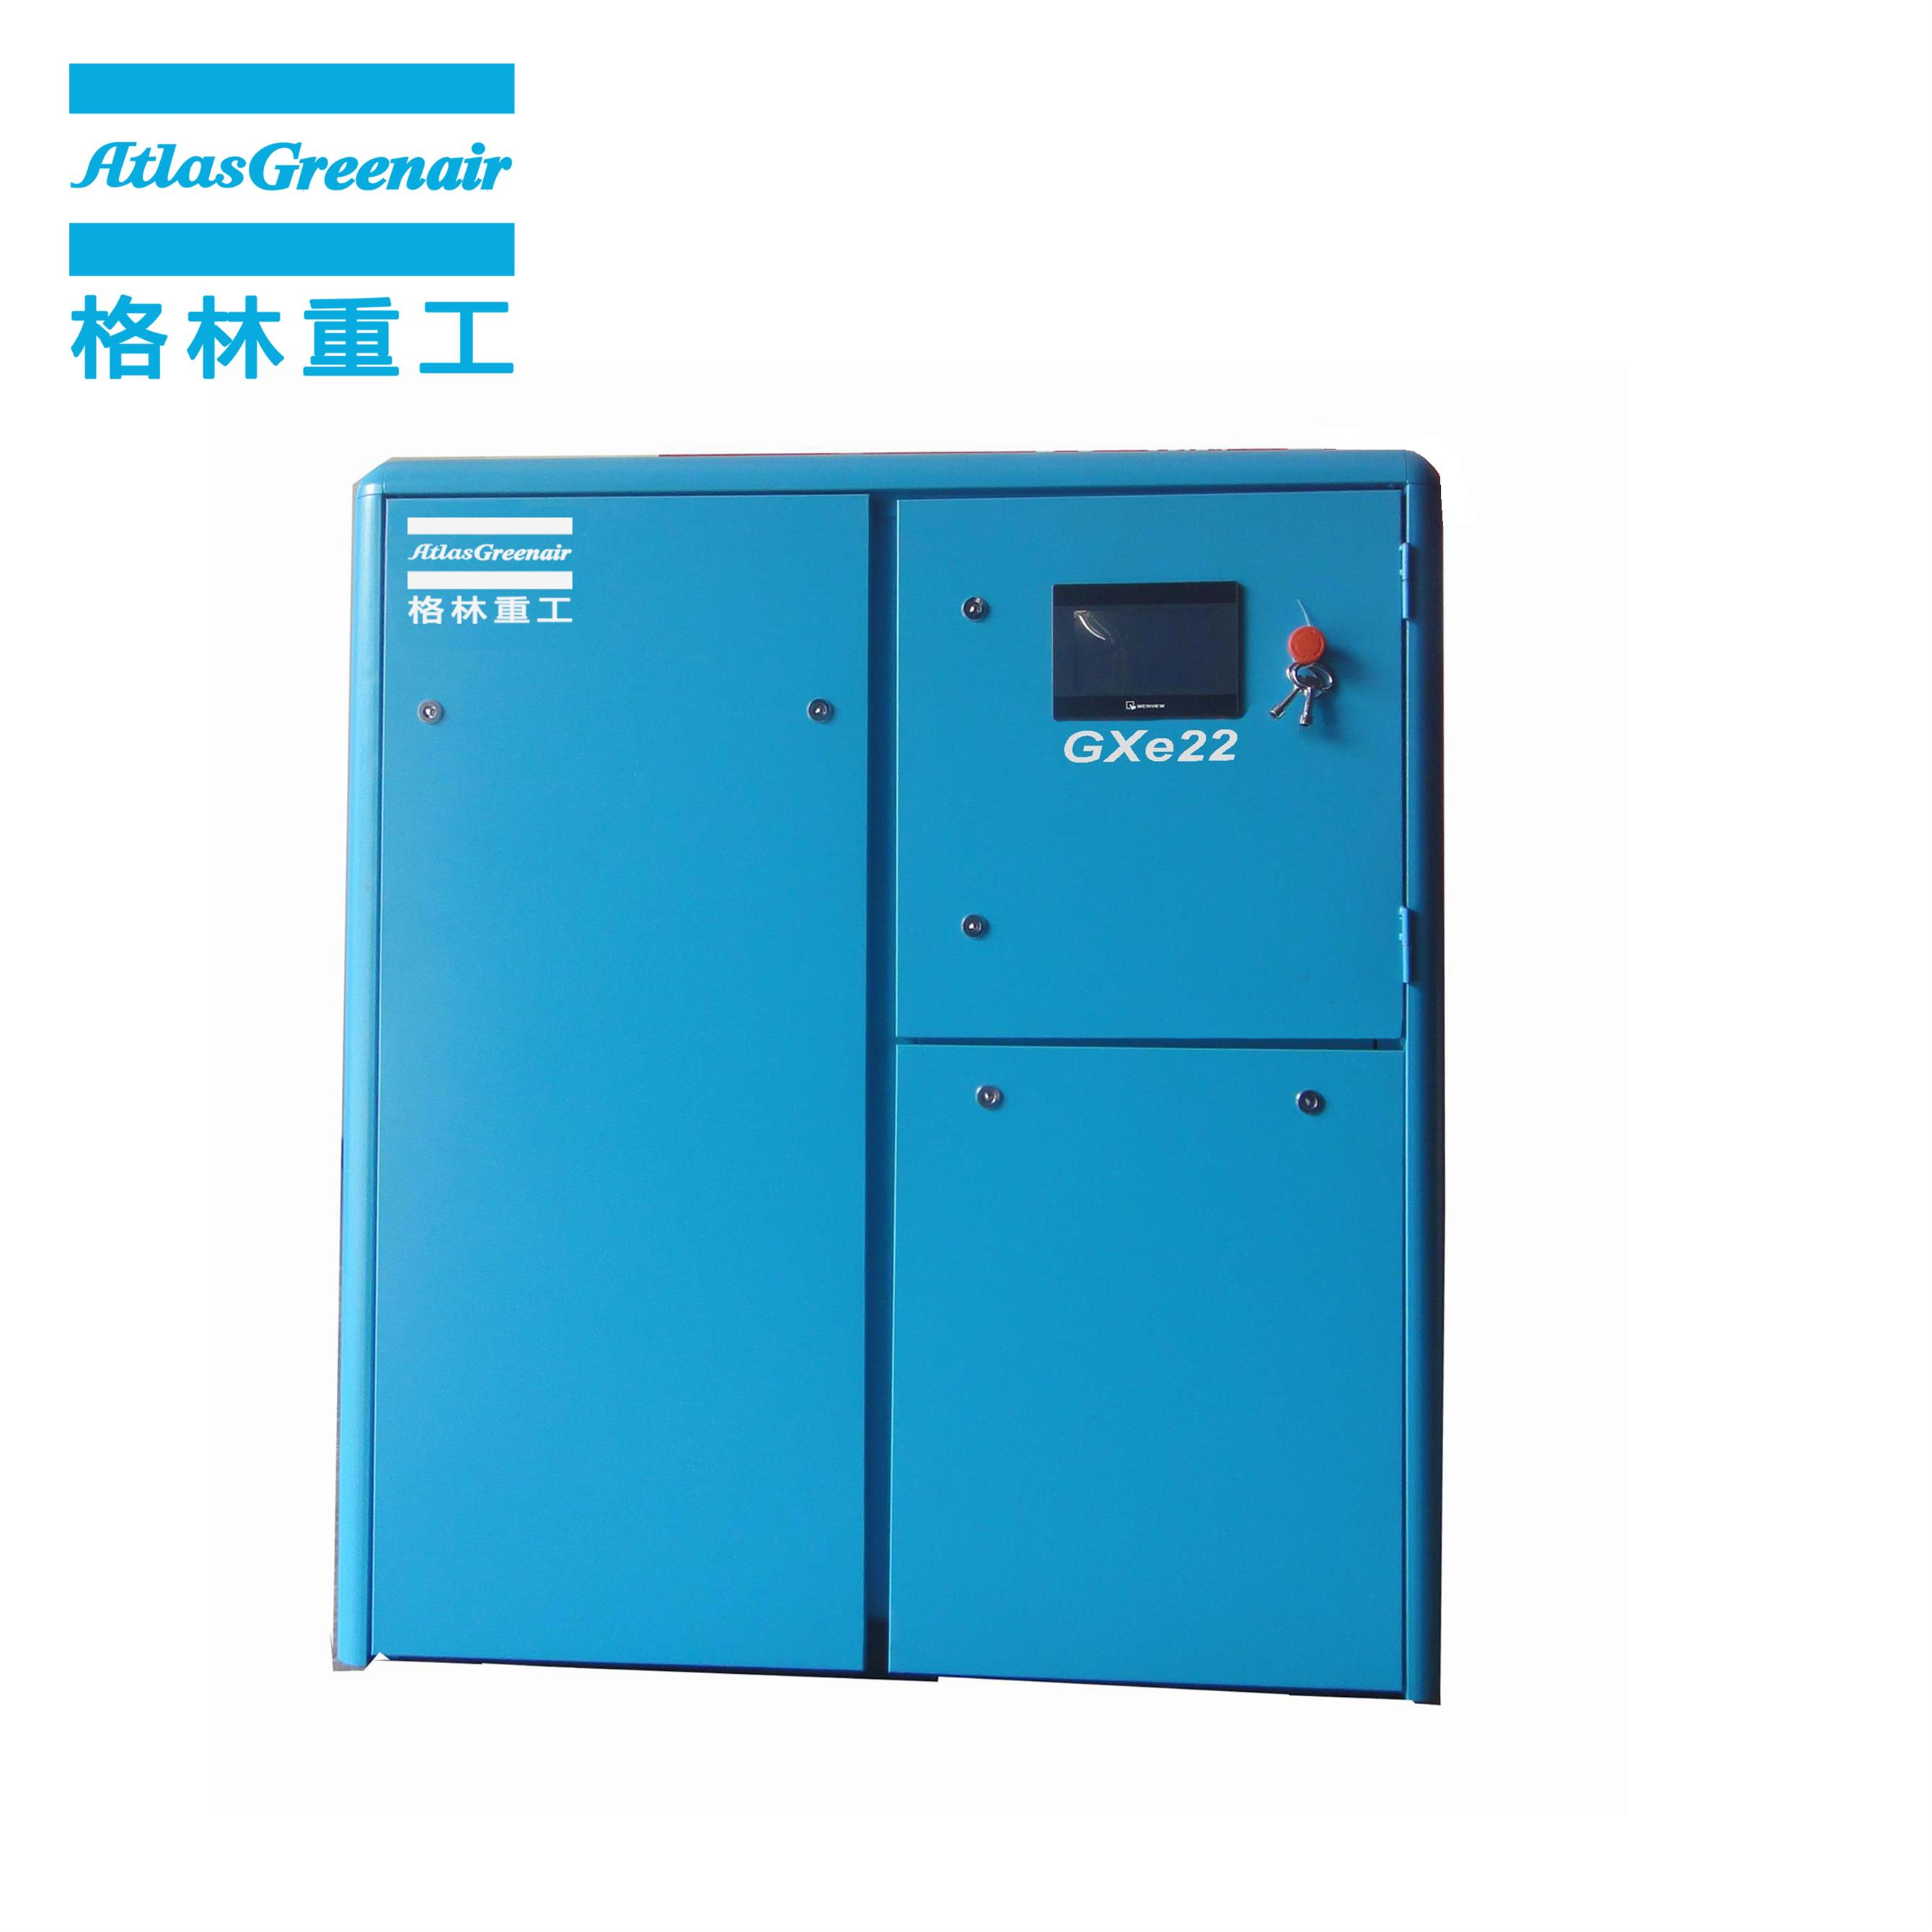 Atlas Greenair Screw Air Compressor fixed speed rotary screw air compressor supplier for tropical area-2